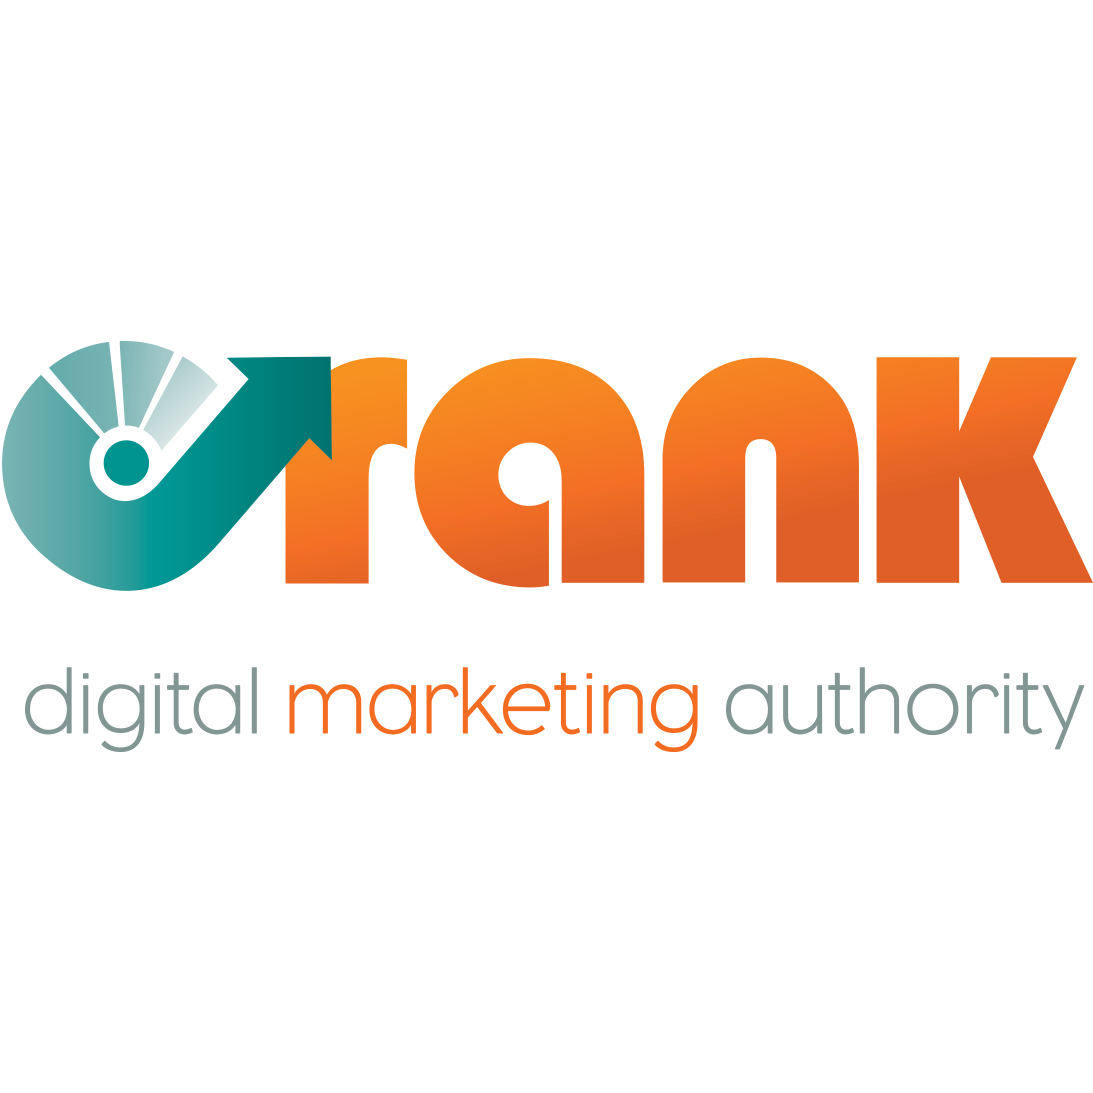 CRANK Digital Marketing Authority   Web Design & Development